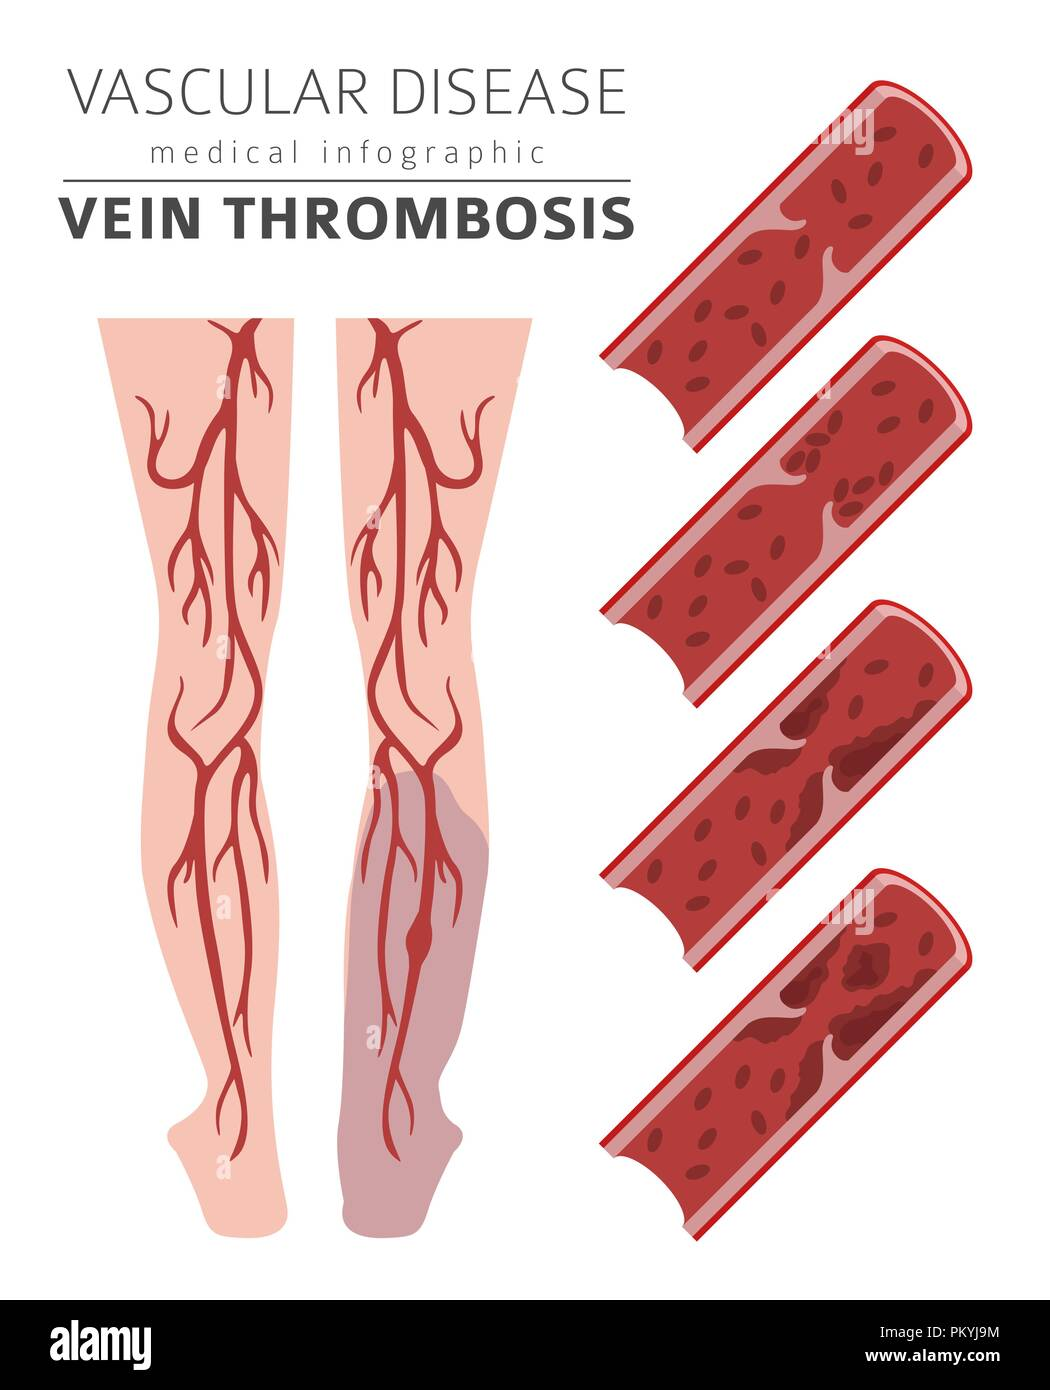 Vascular diseases. Vein thrombosis symptoms, treatment icon set. Medical infographic design. Vector illustration - Stock Image